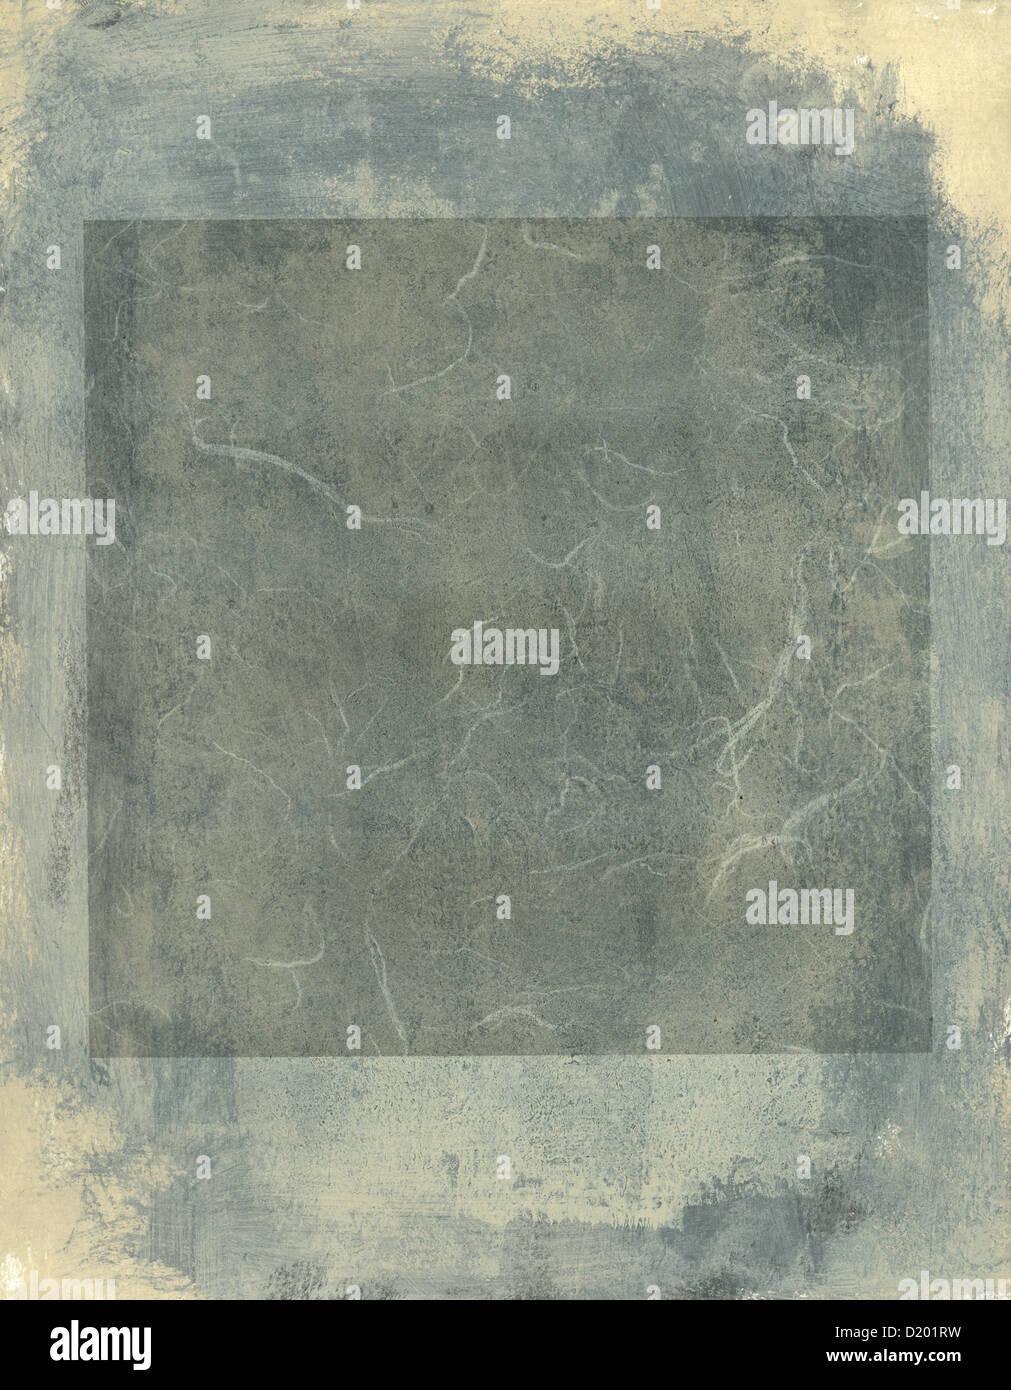 Abstrakte Malerei grauen Tönen und Quare. Stockbild